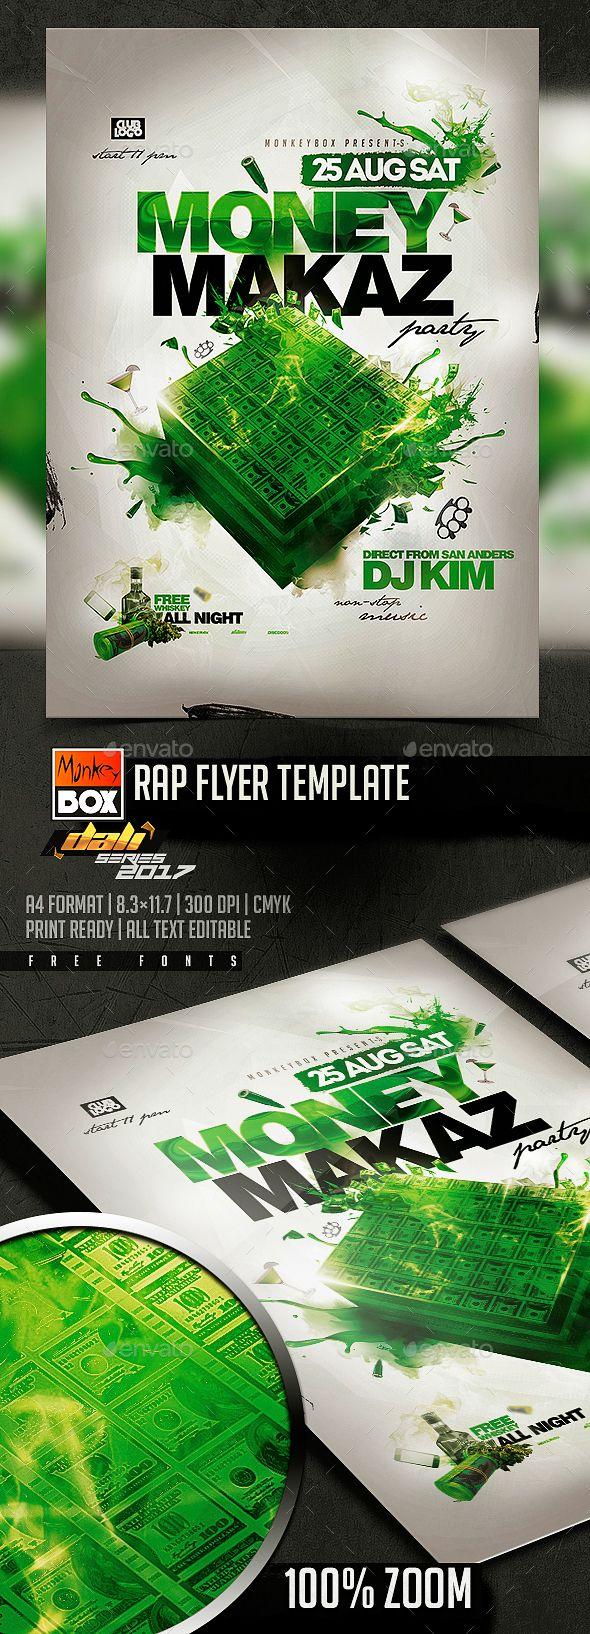 rap flyer template pinterest flyer template template and fonts